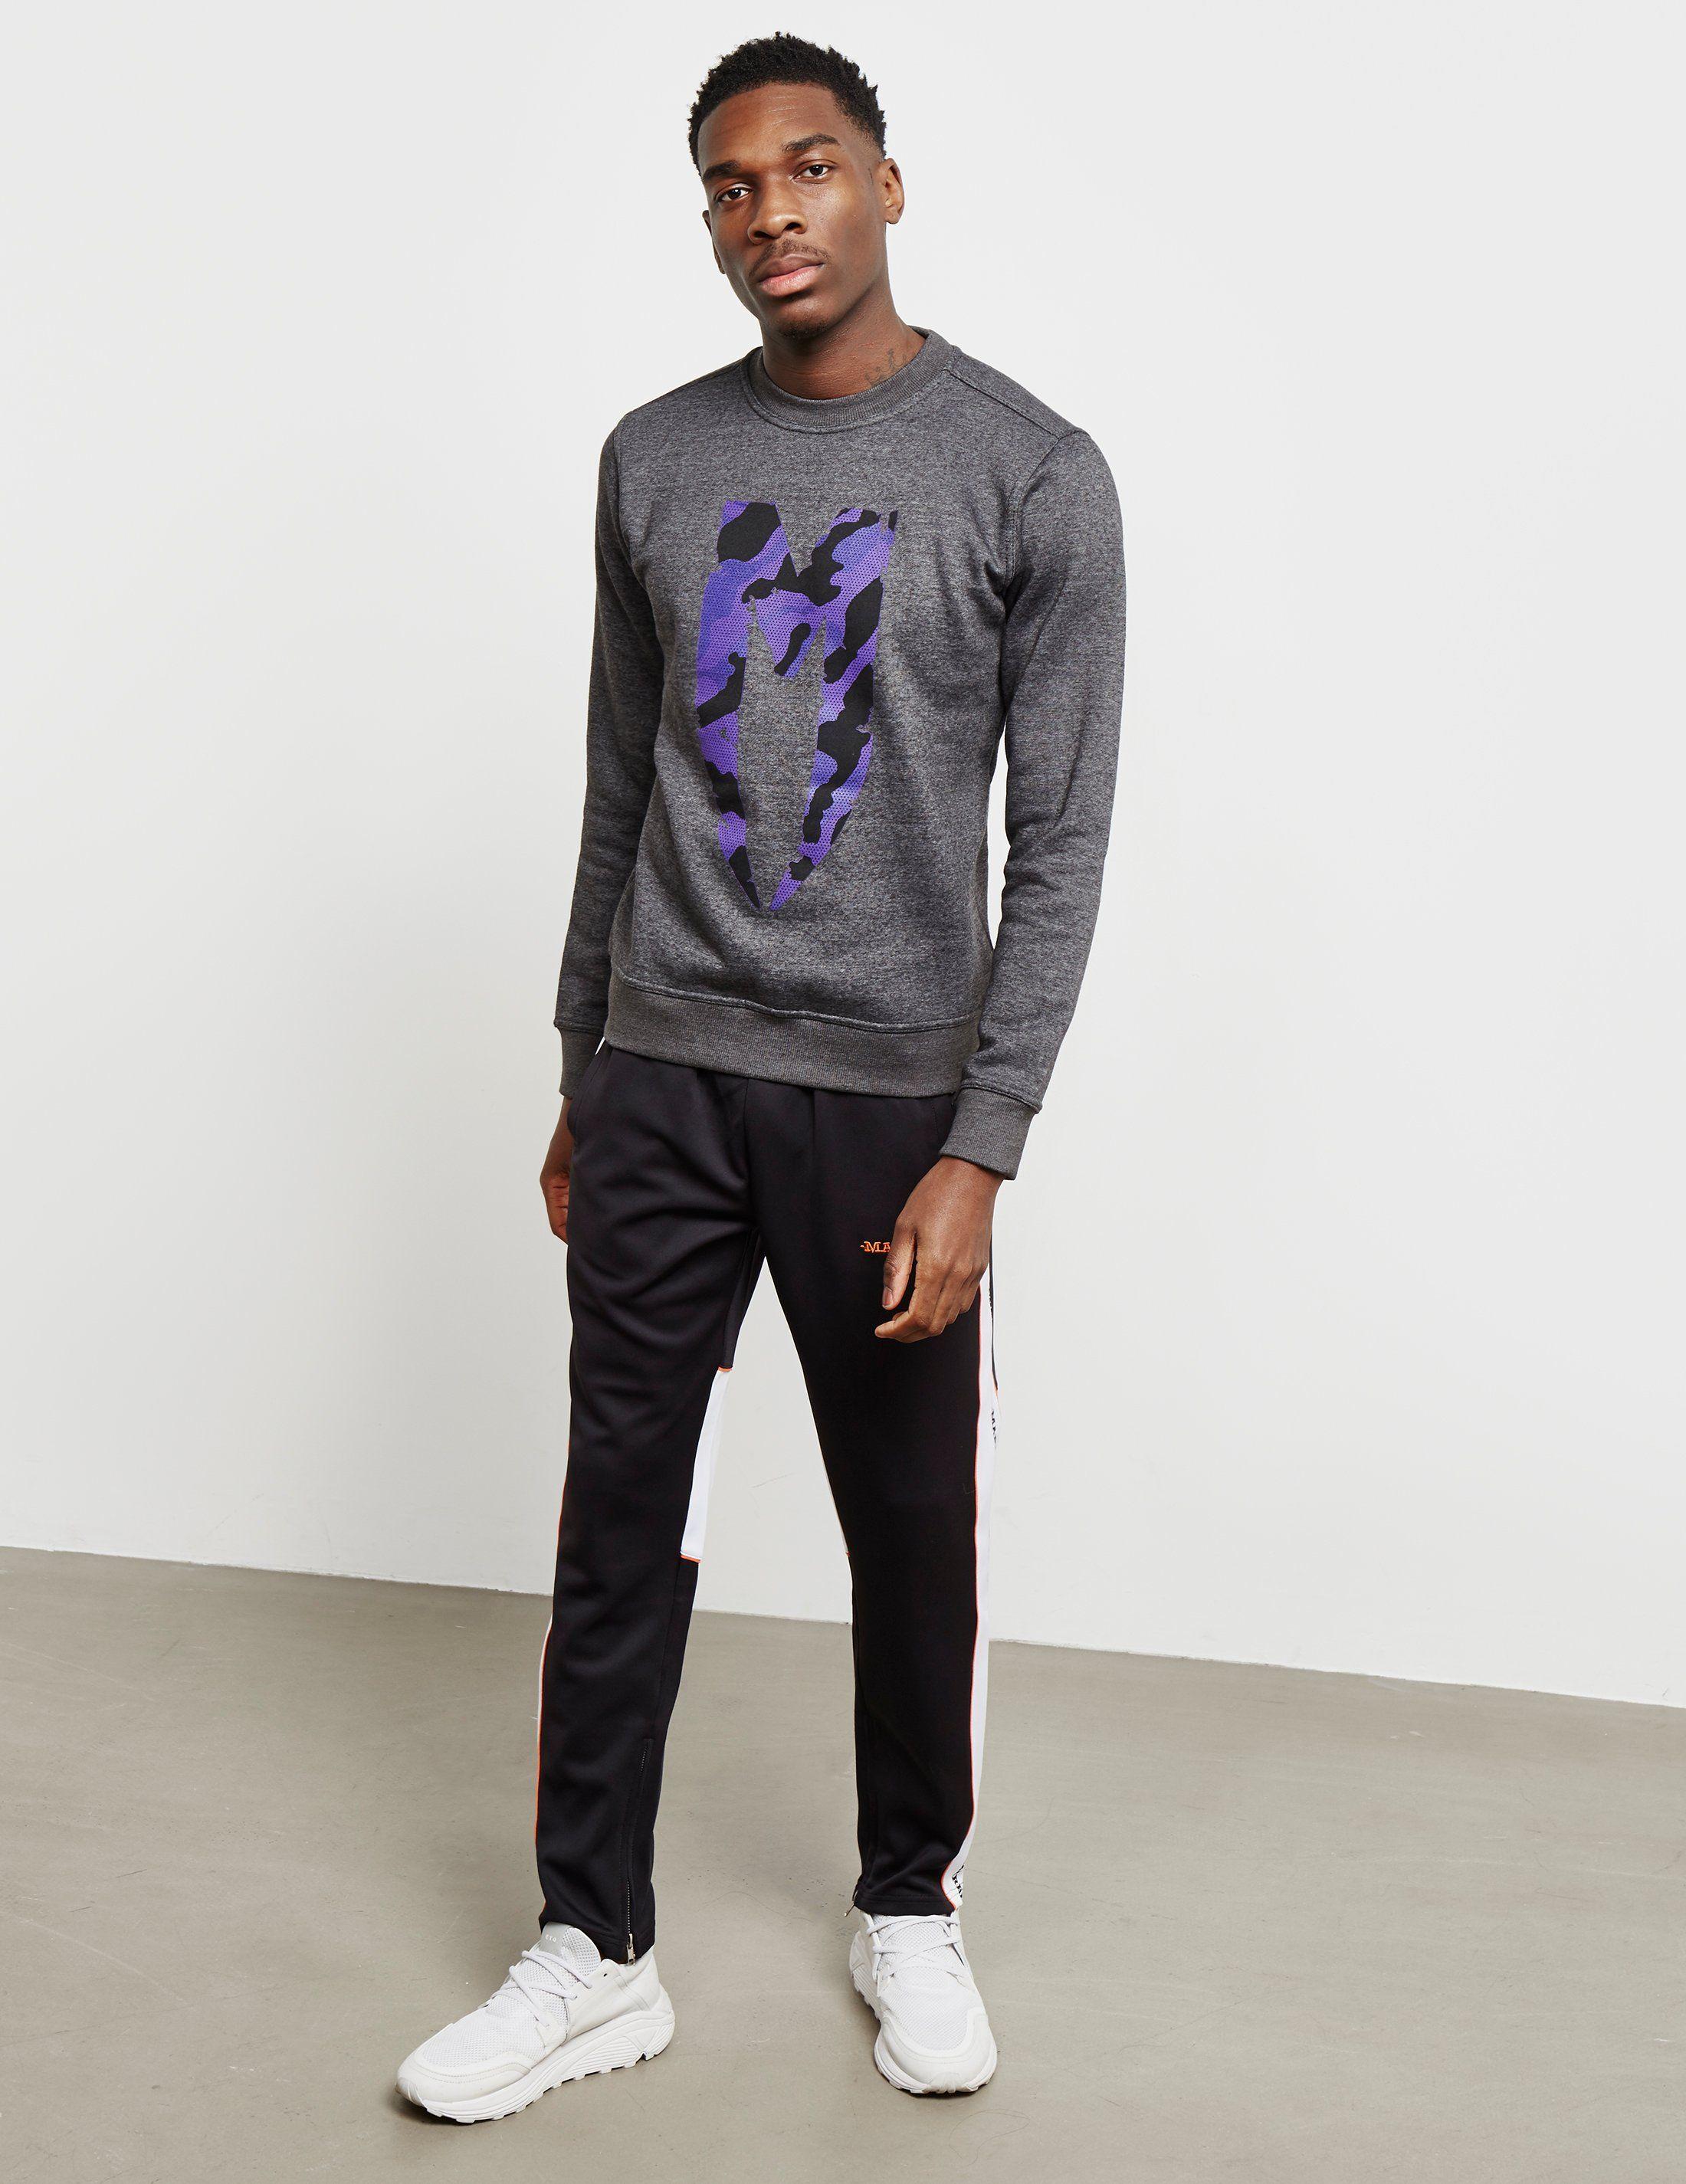 Marbek M Logo Sweatshirt - Exclusive